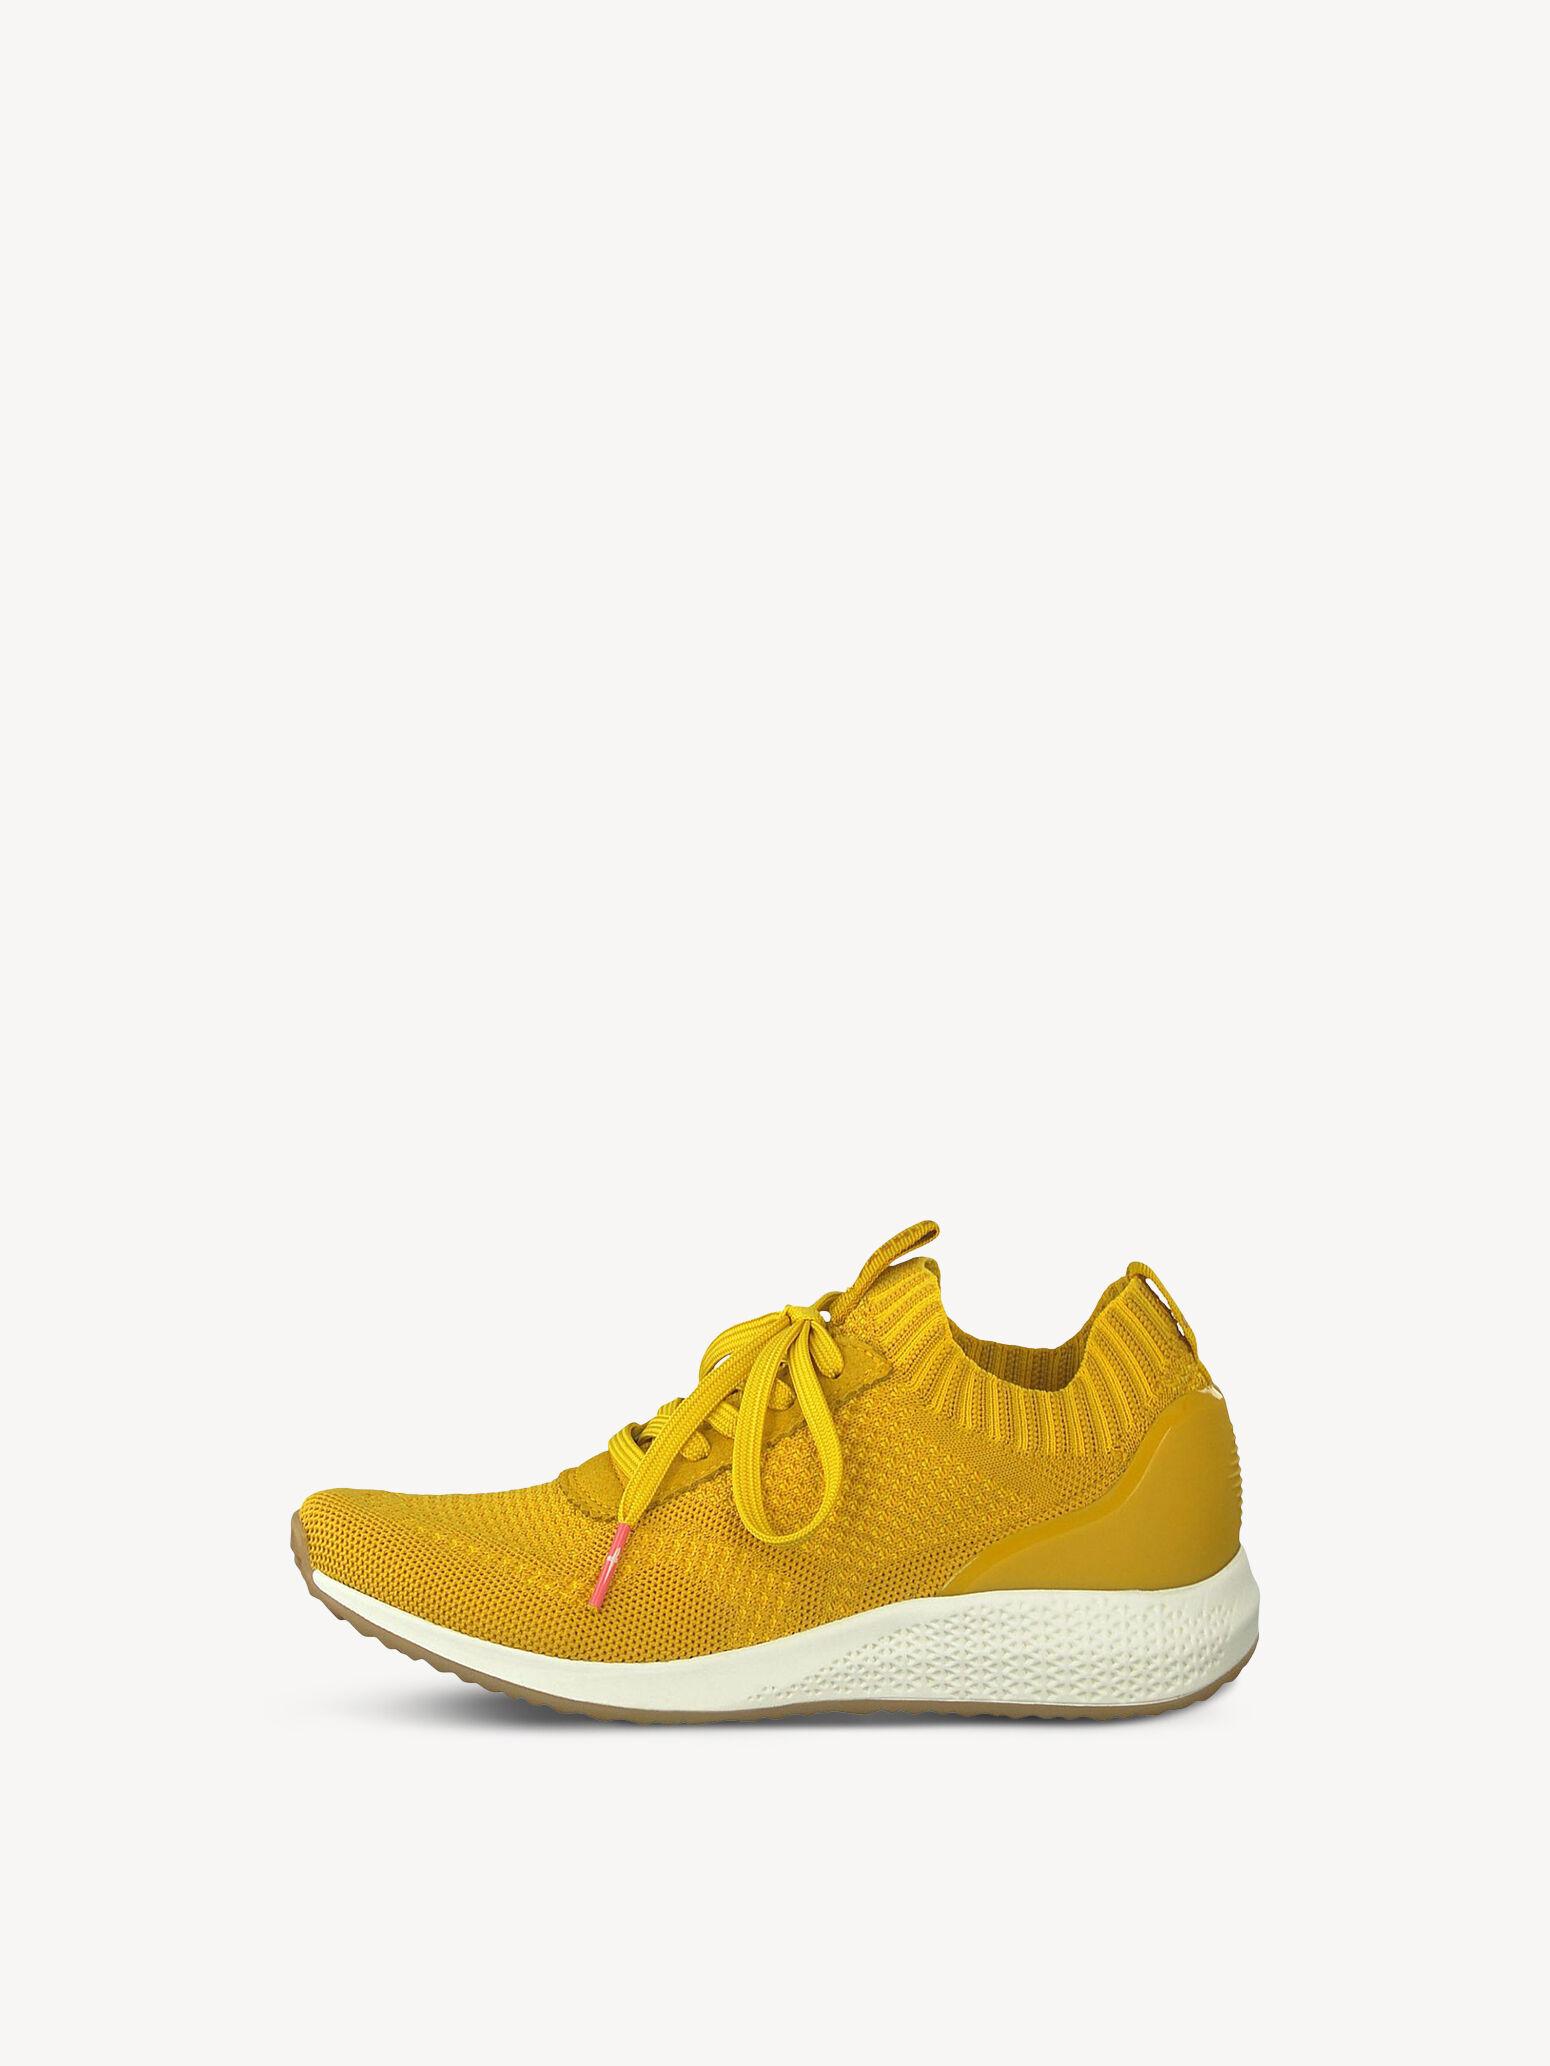 Tamaris Chaussures Baskets Chaussures Femmes Tamaris QBEdeWrCxo